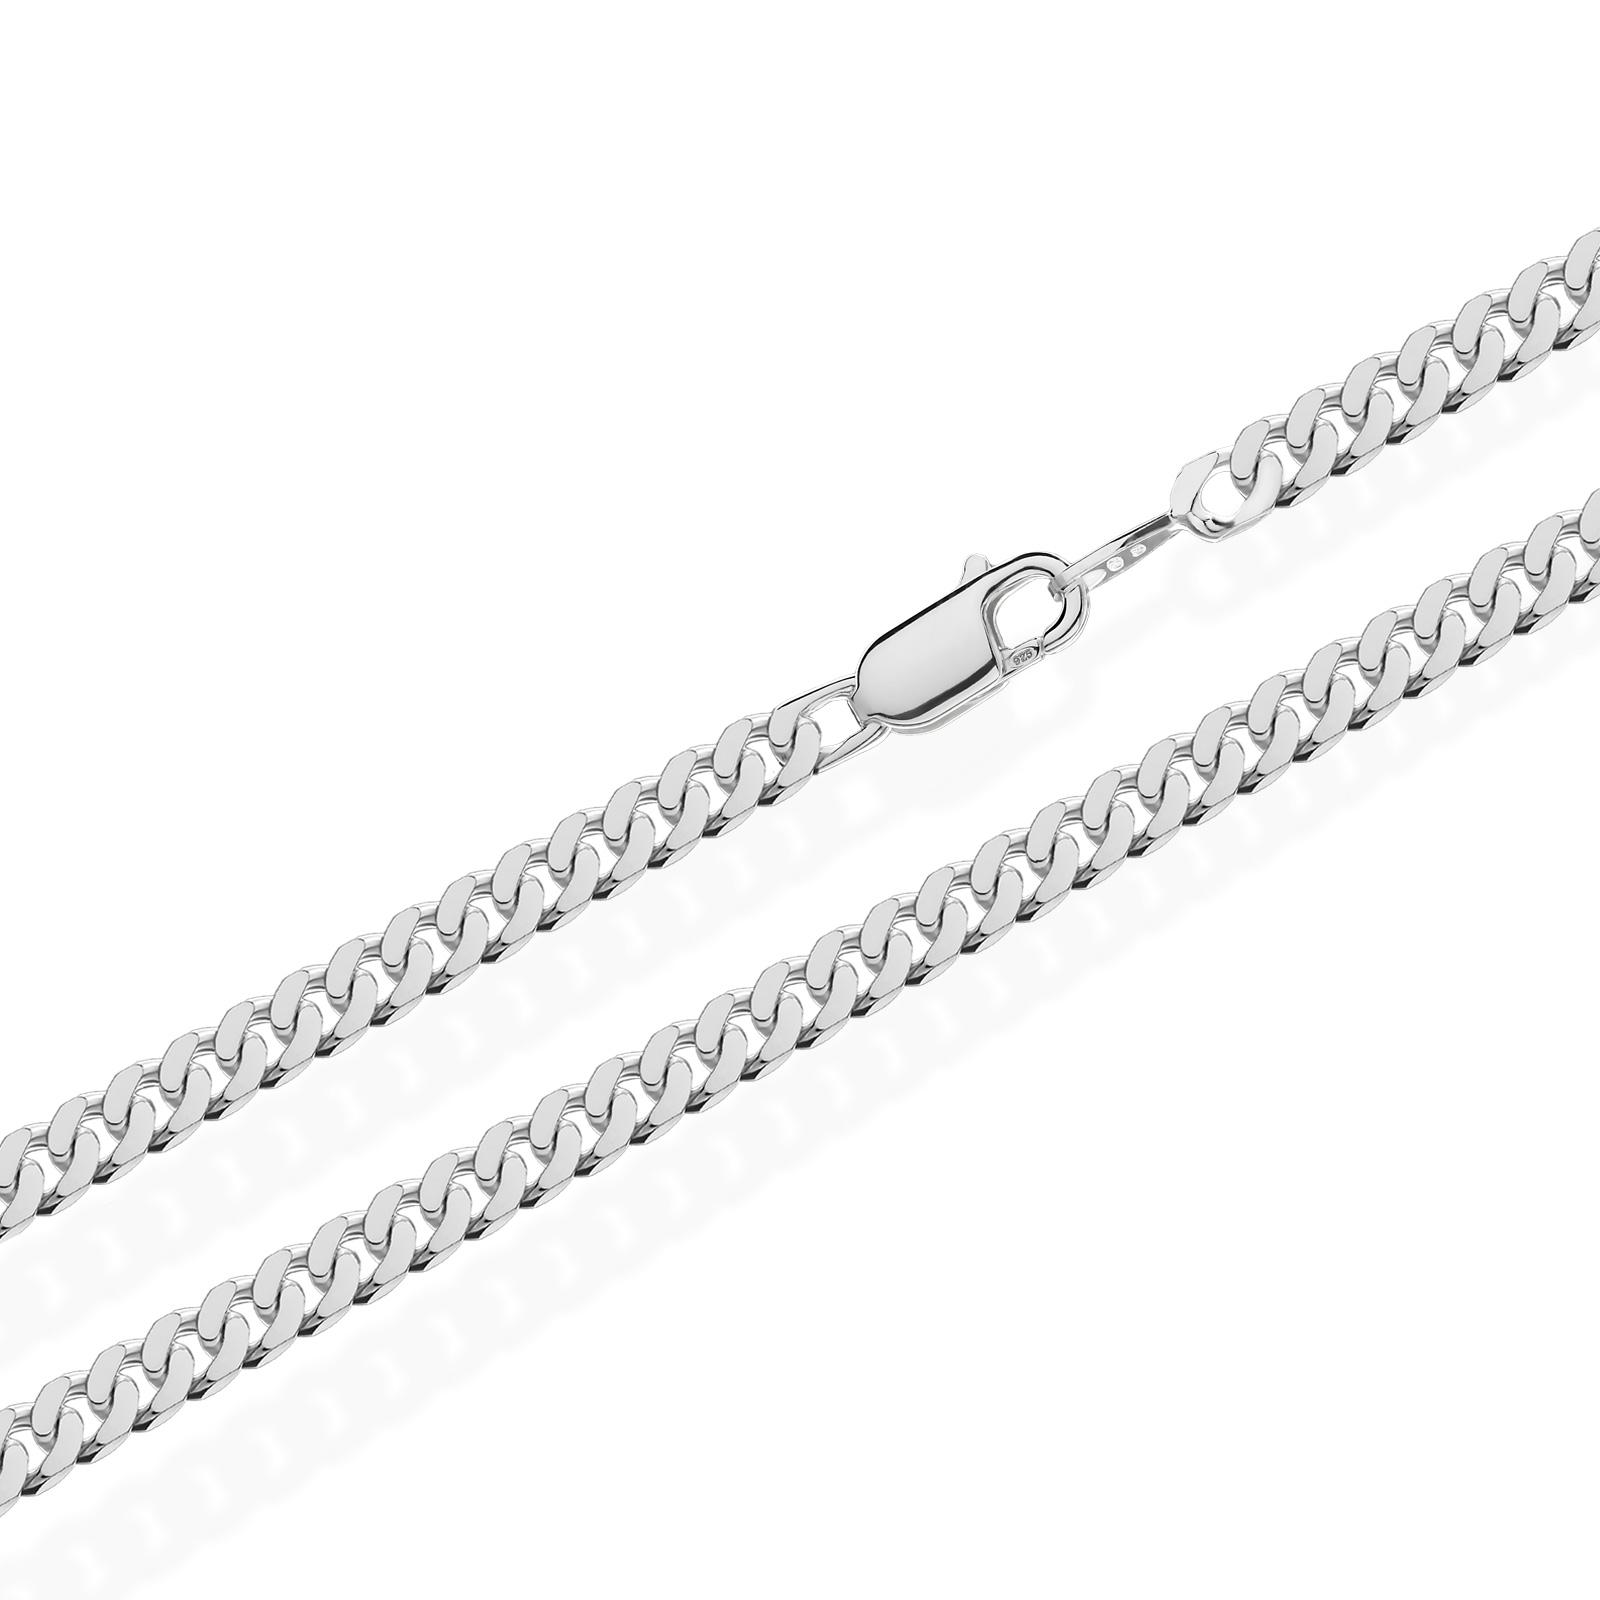 Real-925-Sterling-cadena-de-plata-tanques-cadena-rey-cadena-Collier-collar-masivamente